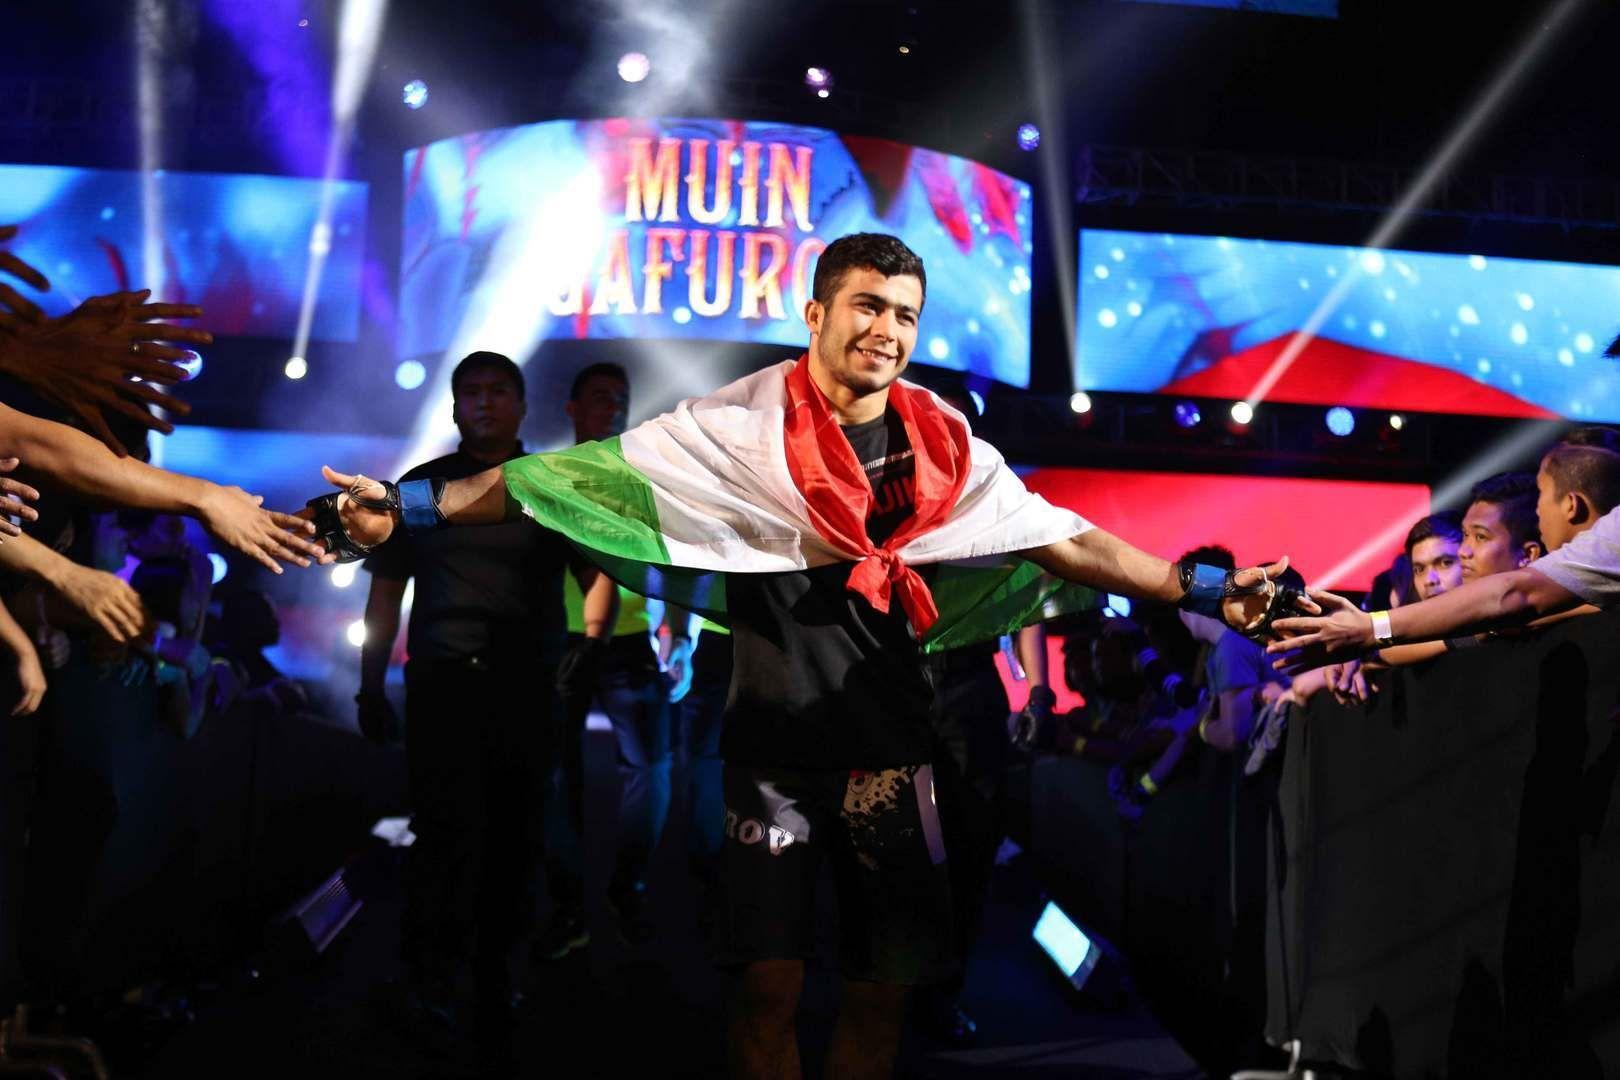 Muin Gafurov makes his entrance